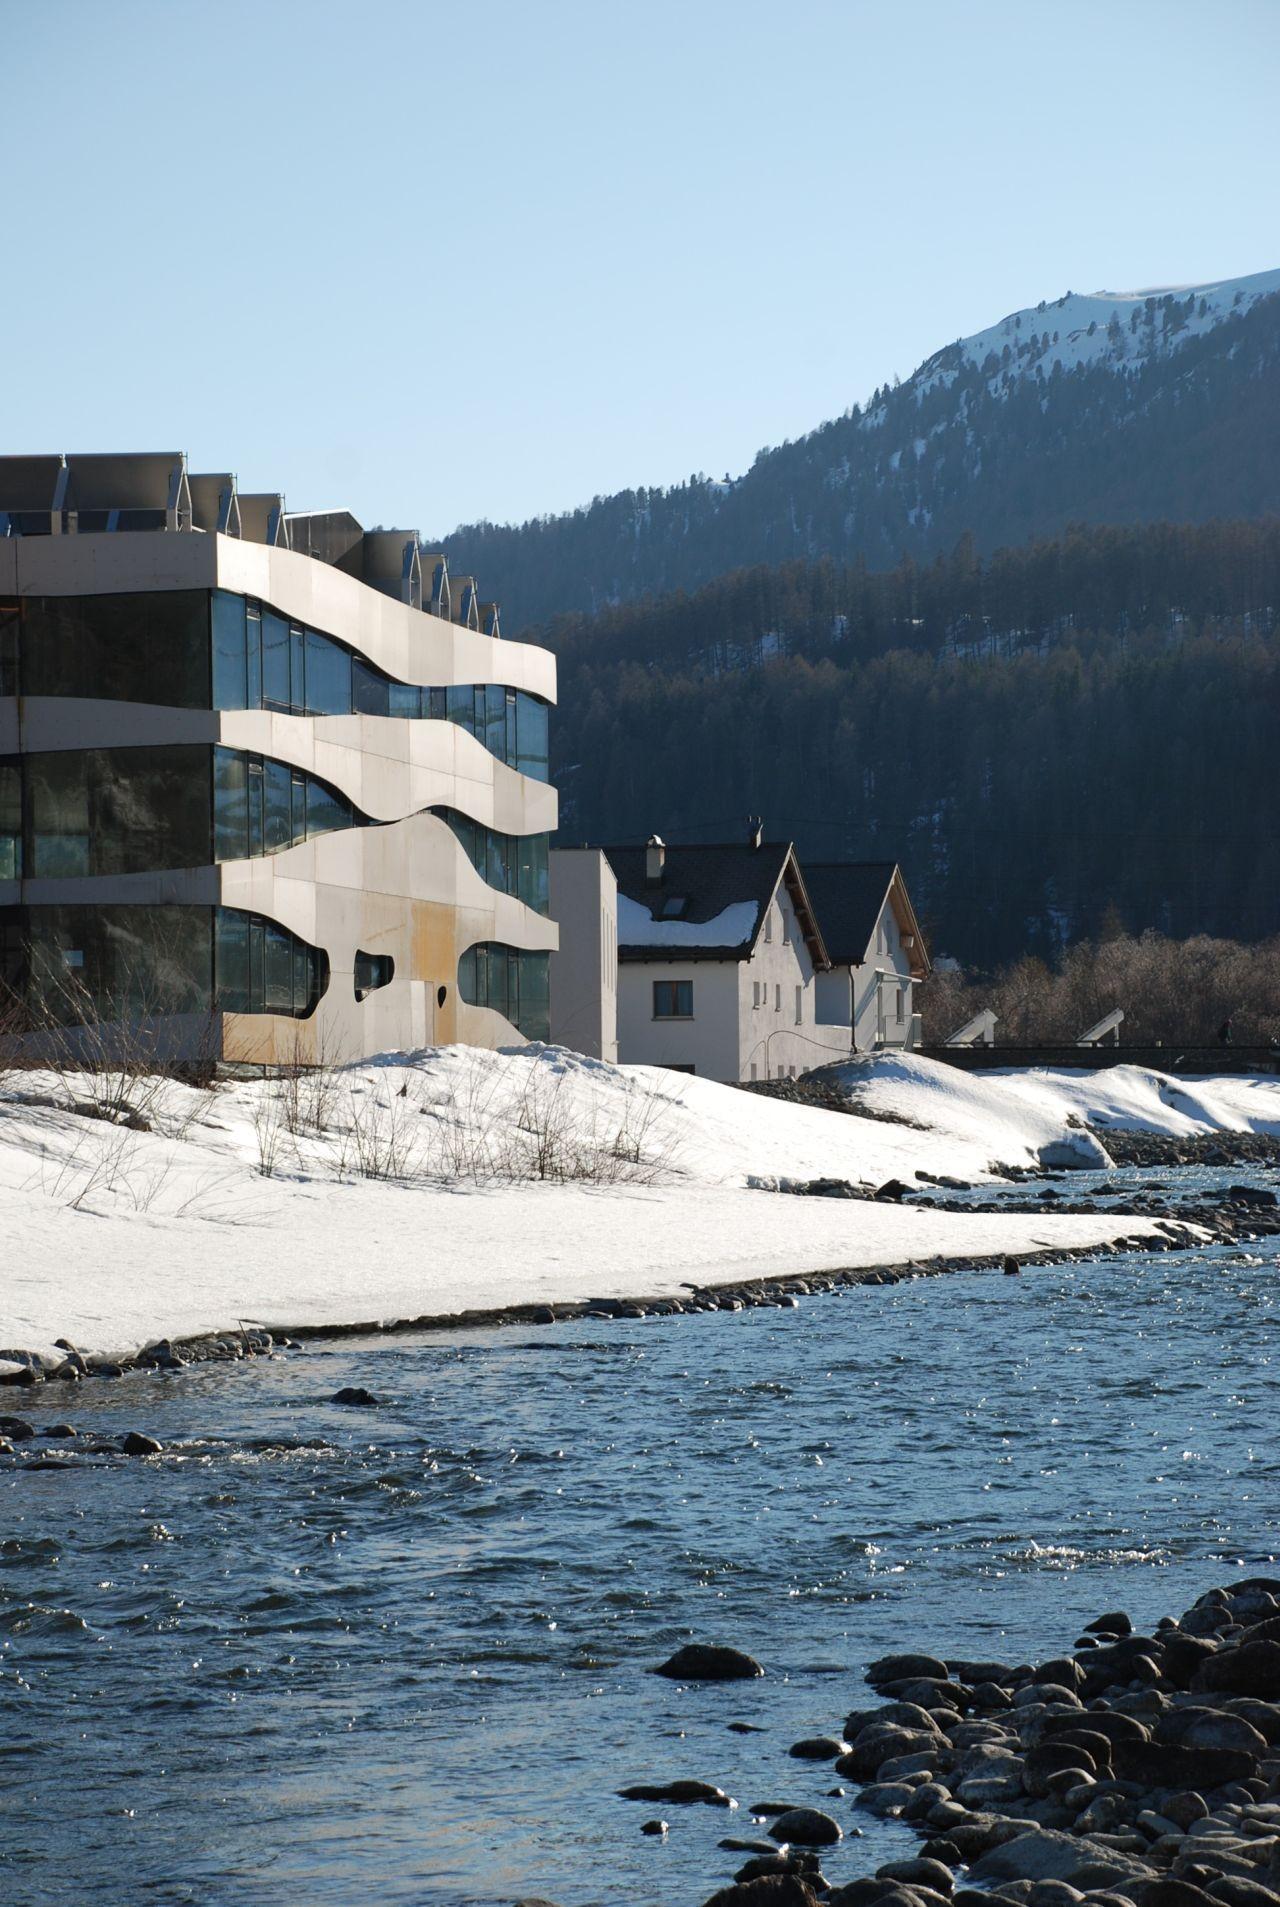 Commercial Building Islas / Mierta & Kurt Lazzarini Architekten, Courtesy of Mierta & Kurt Lazzarini Architekten